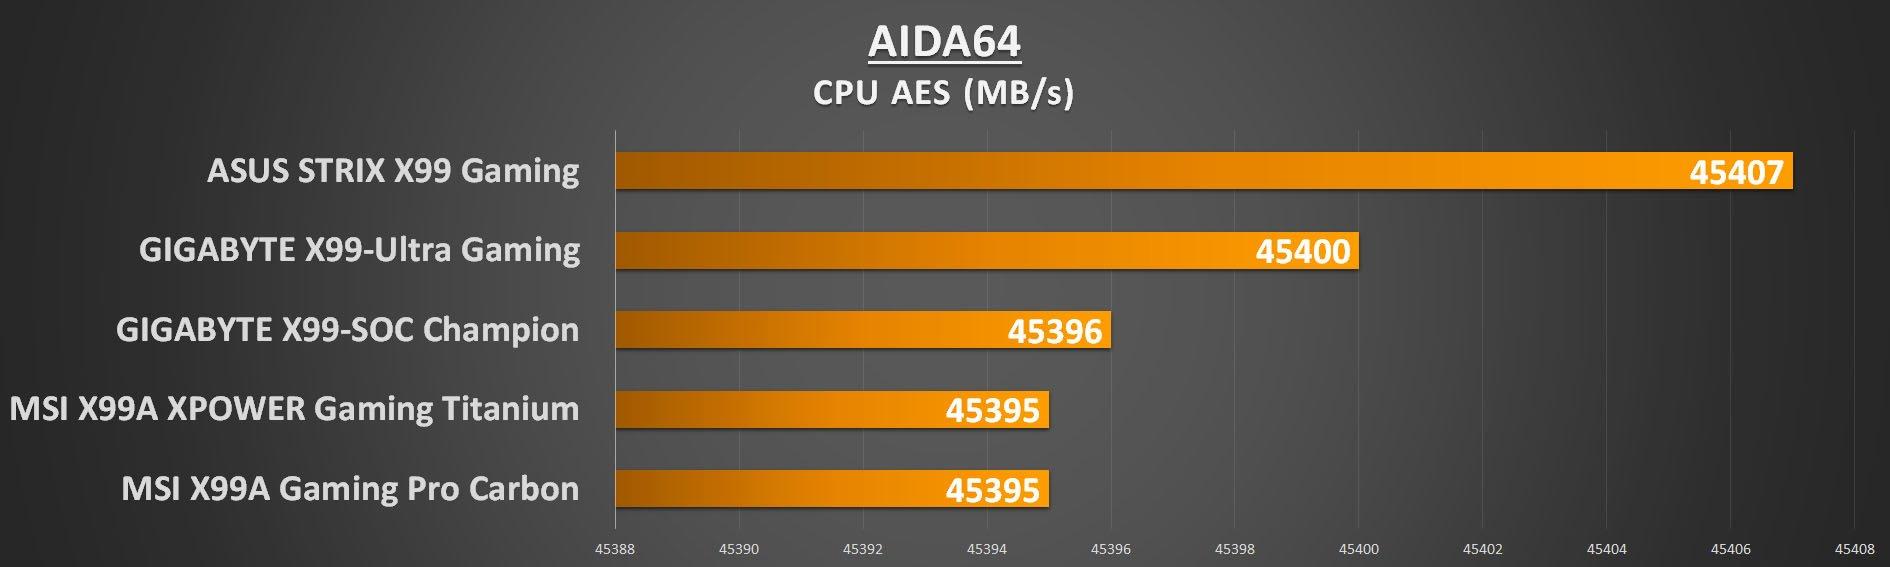 gigabyte-x99-ultra-gaming-aida-aes